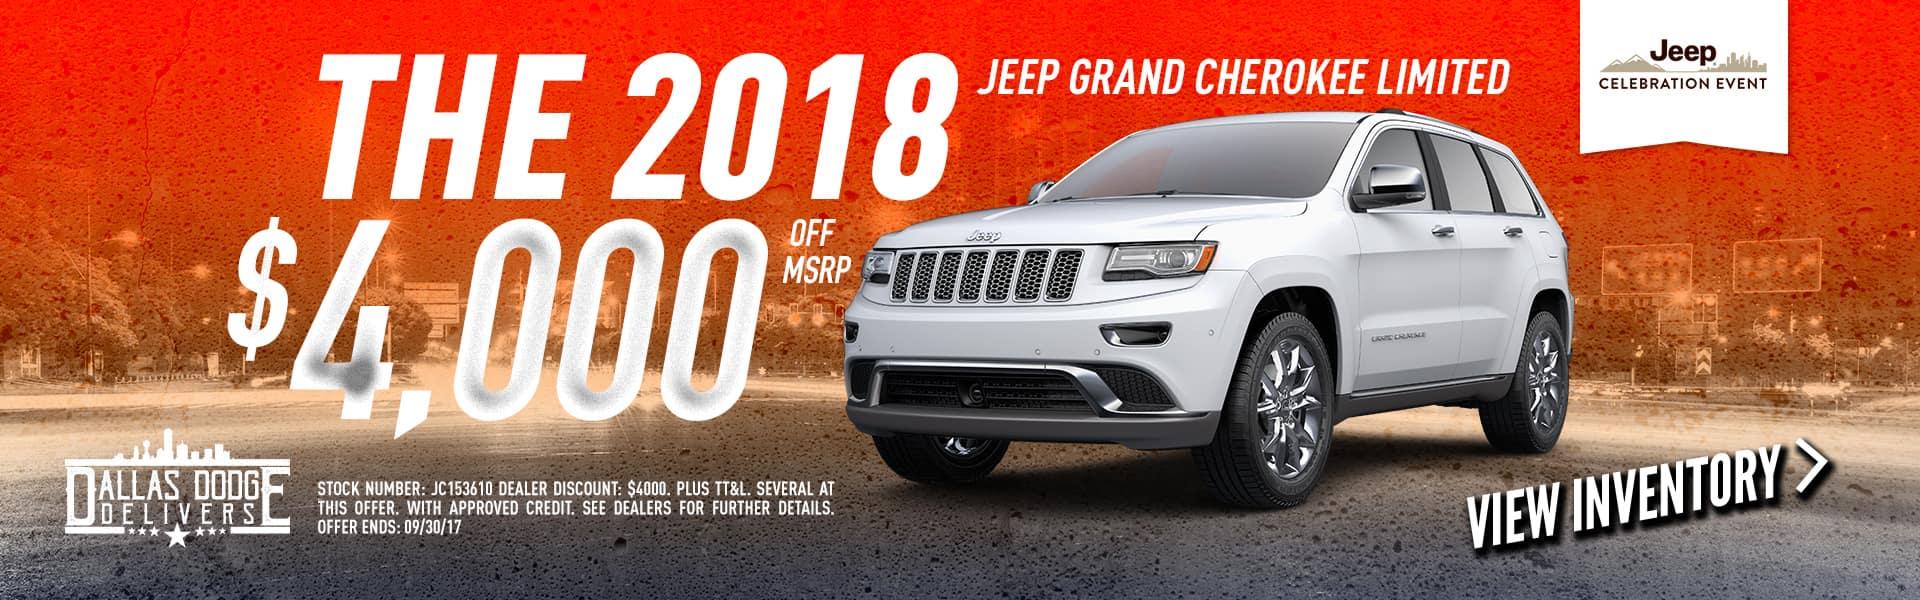 2018 Jeep Cherokee September